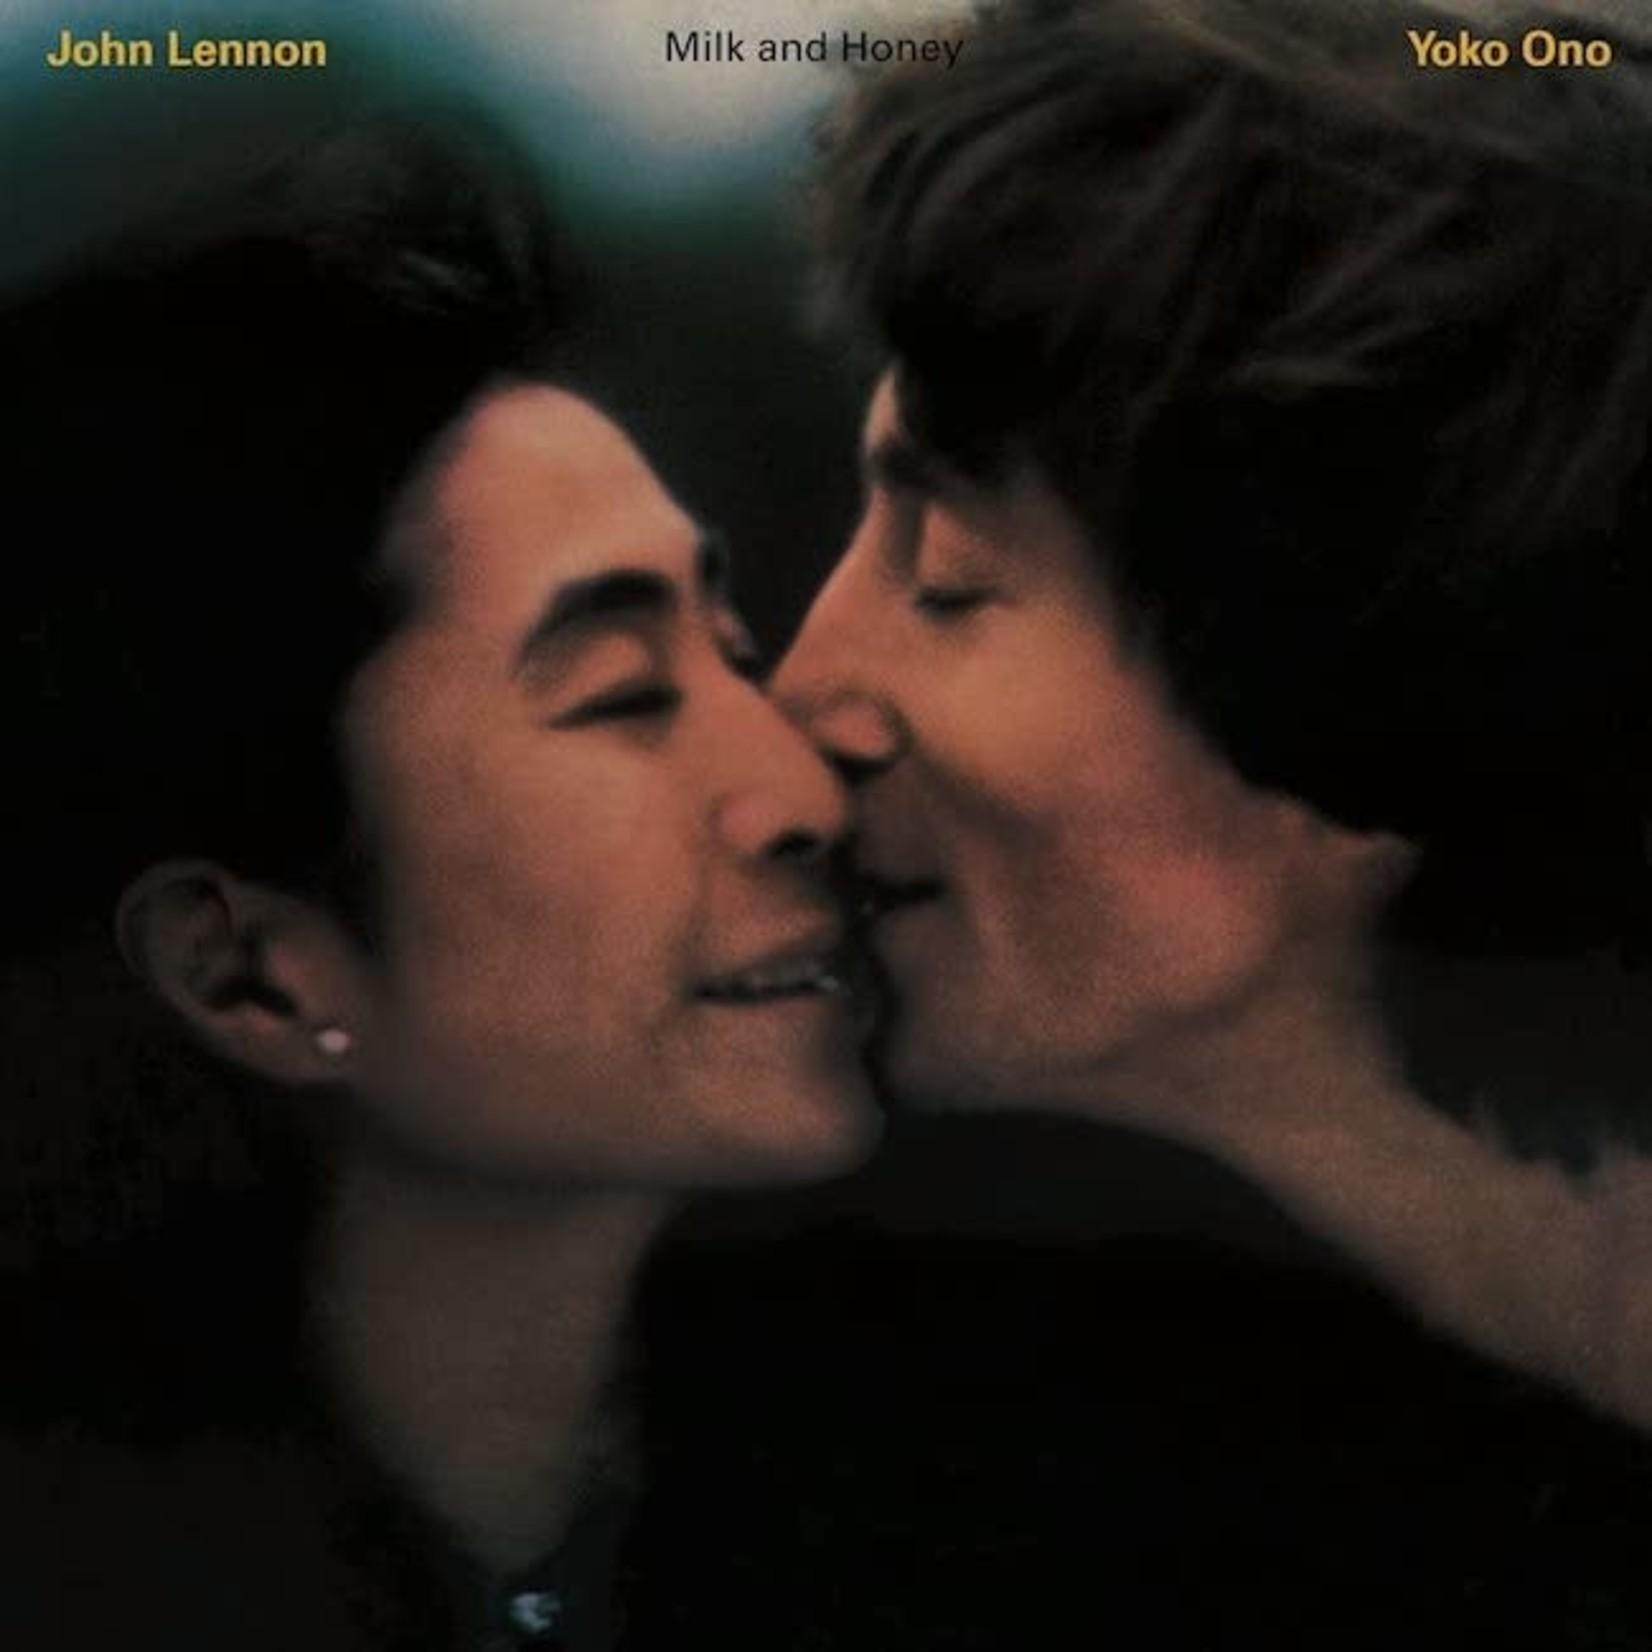 [Vintage] Lennon, John & Yoko Ono (Beatles): Milk and Honey